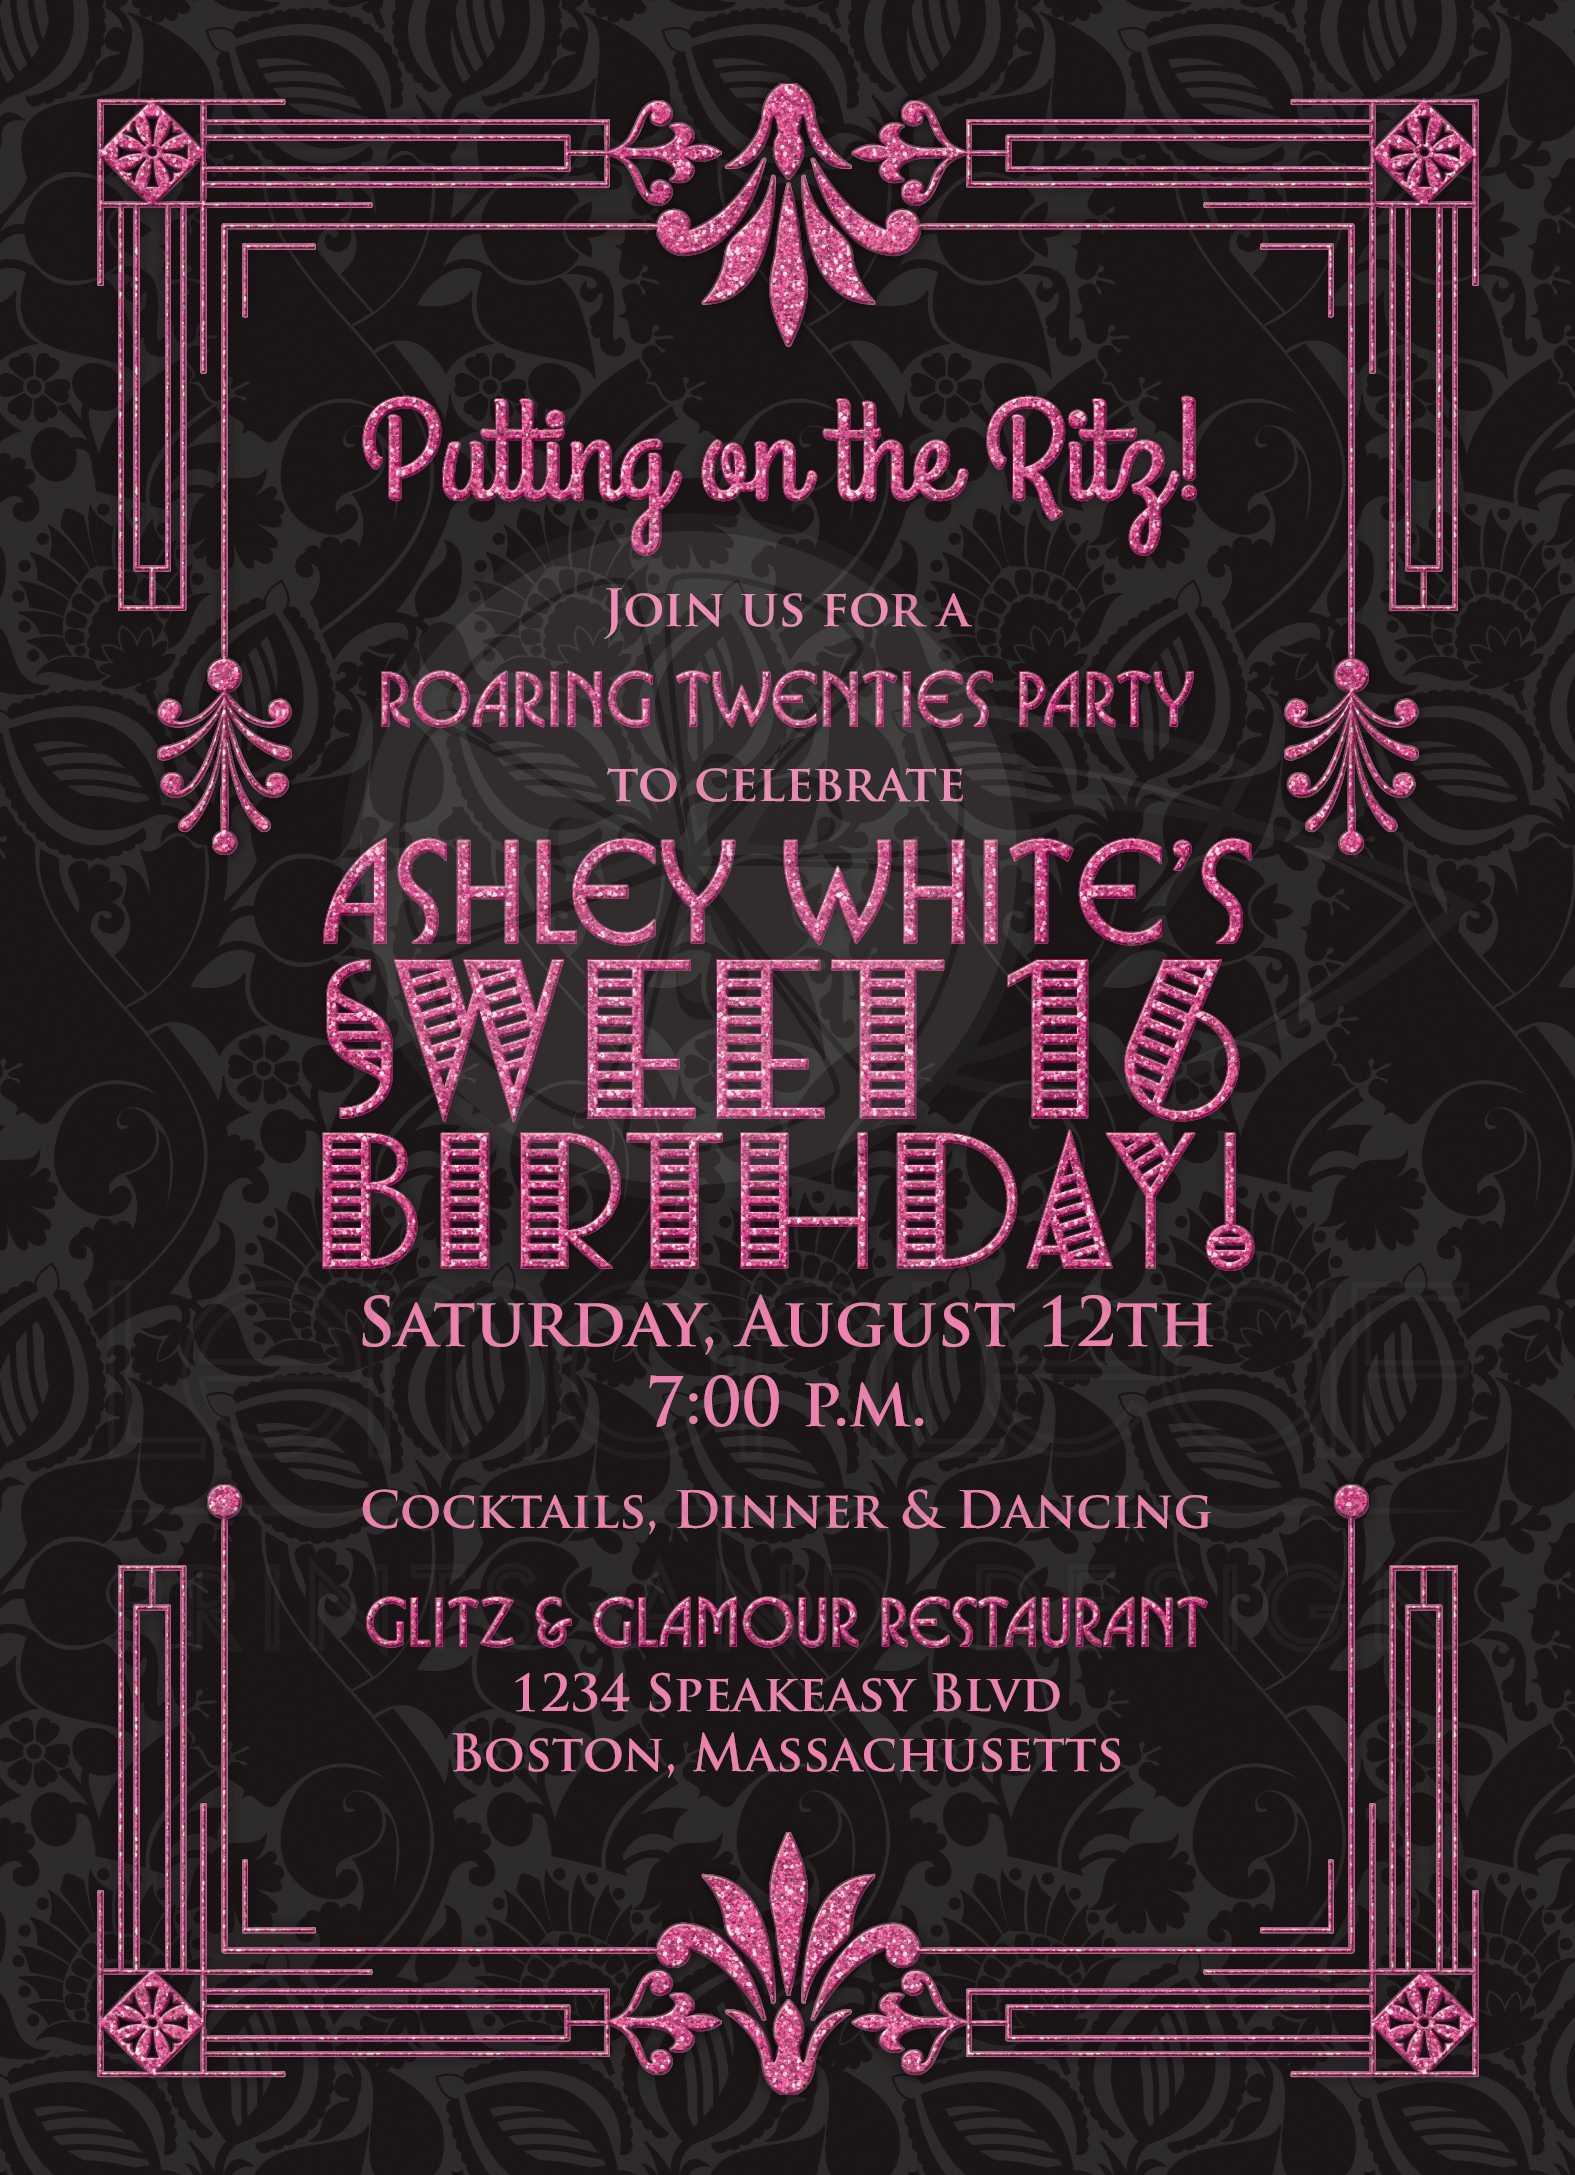 Sweet 16 Birthday Invitation   Roaring 20s Art Deco Black Pink